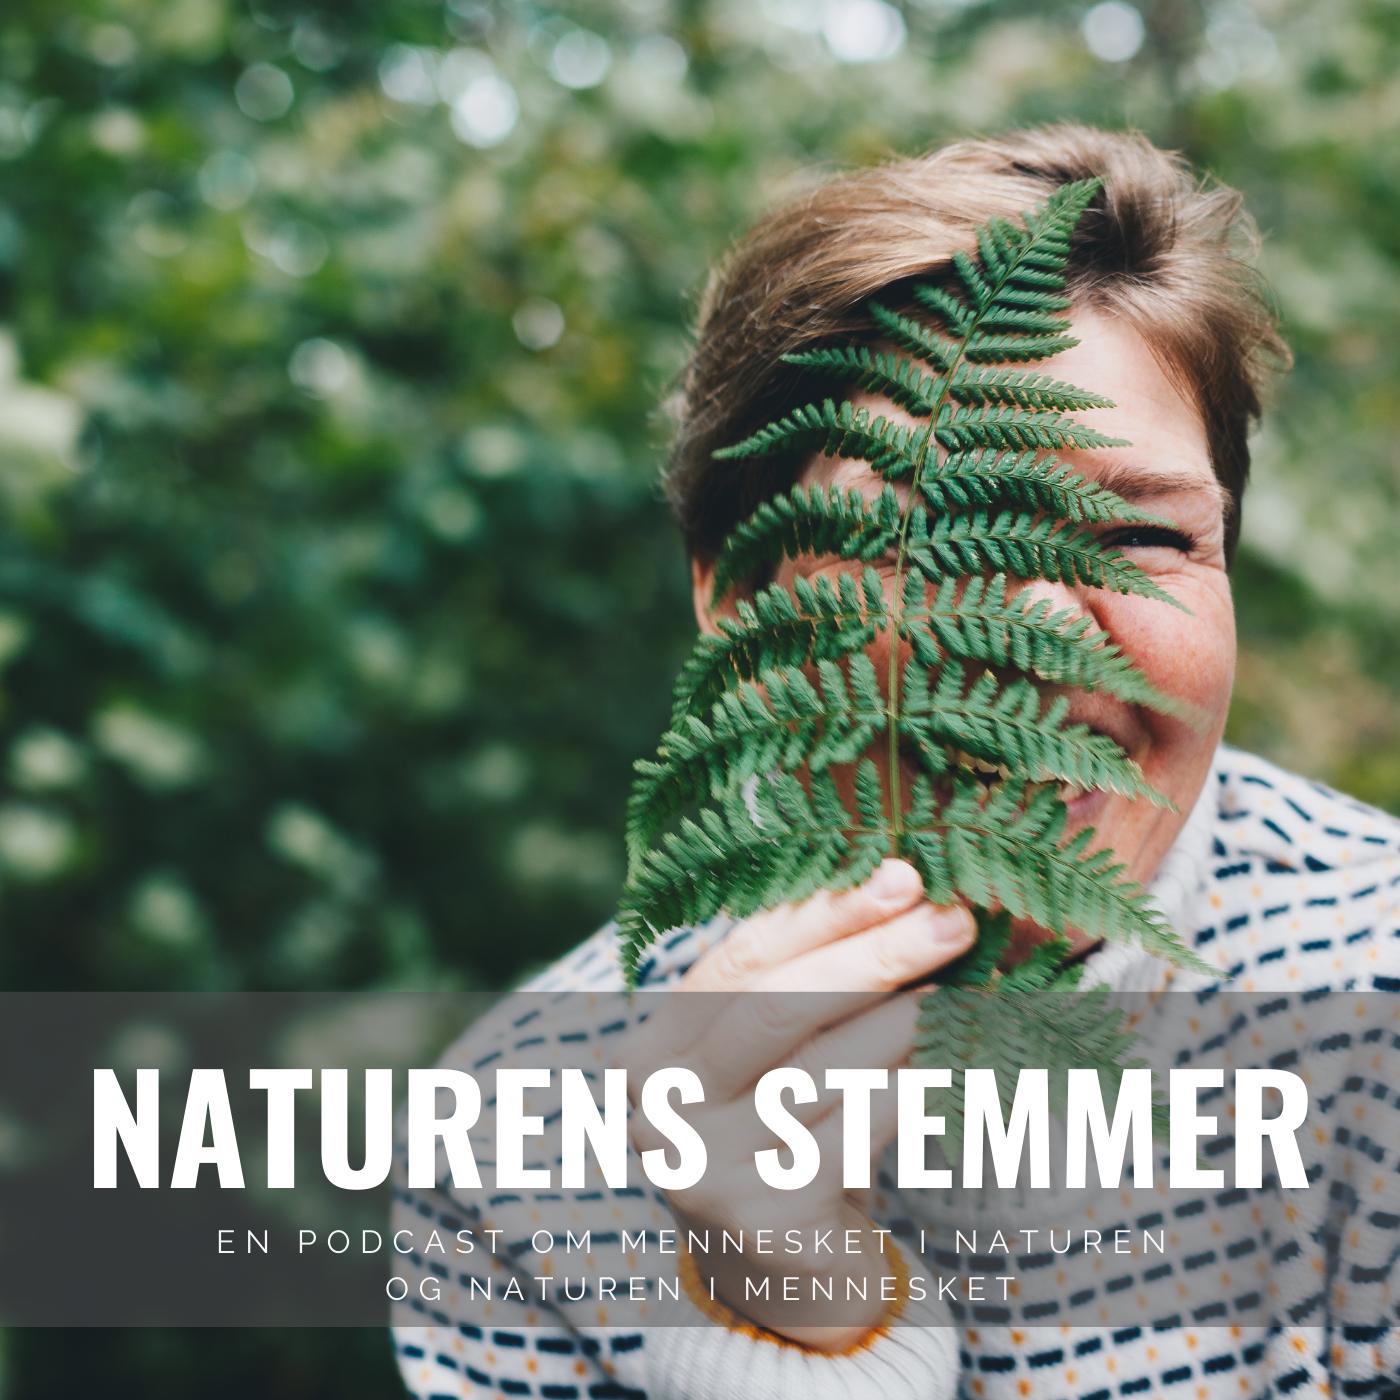 Velkommen til Naturens Stemmer - sæson 2